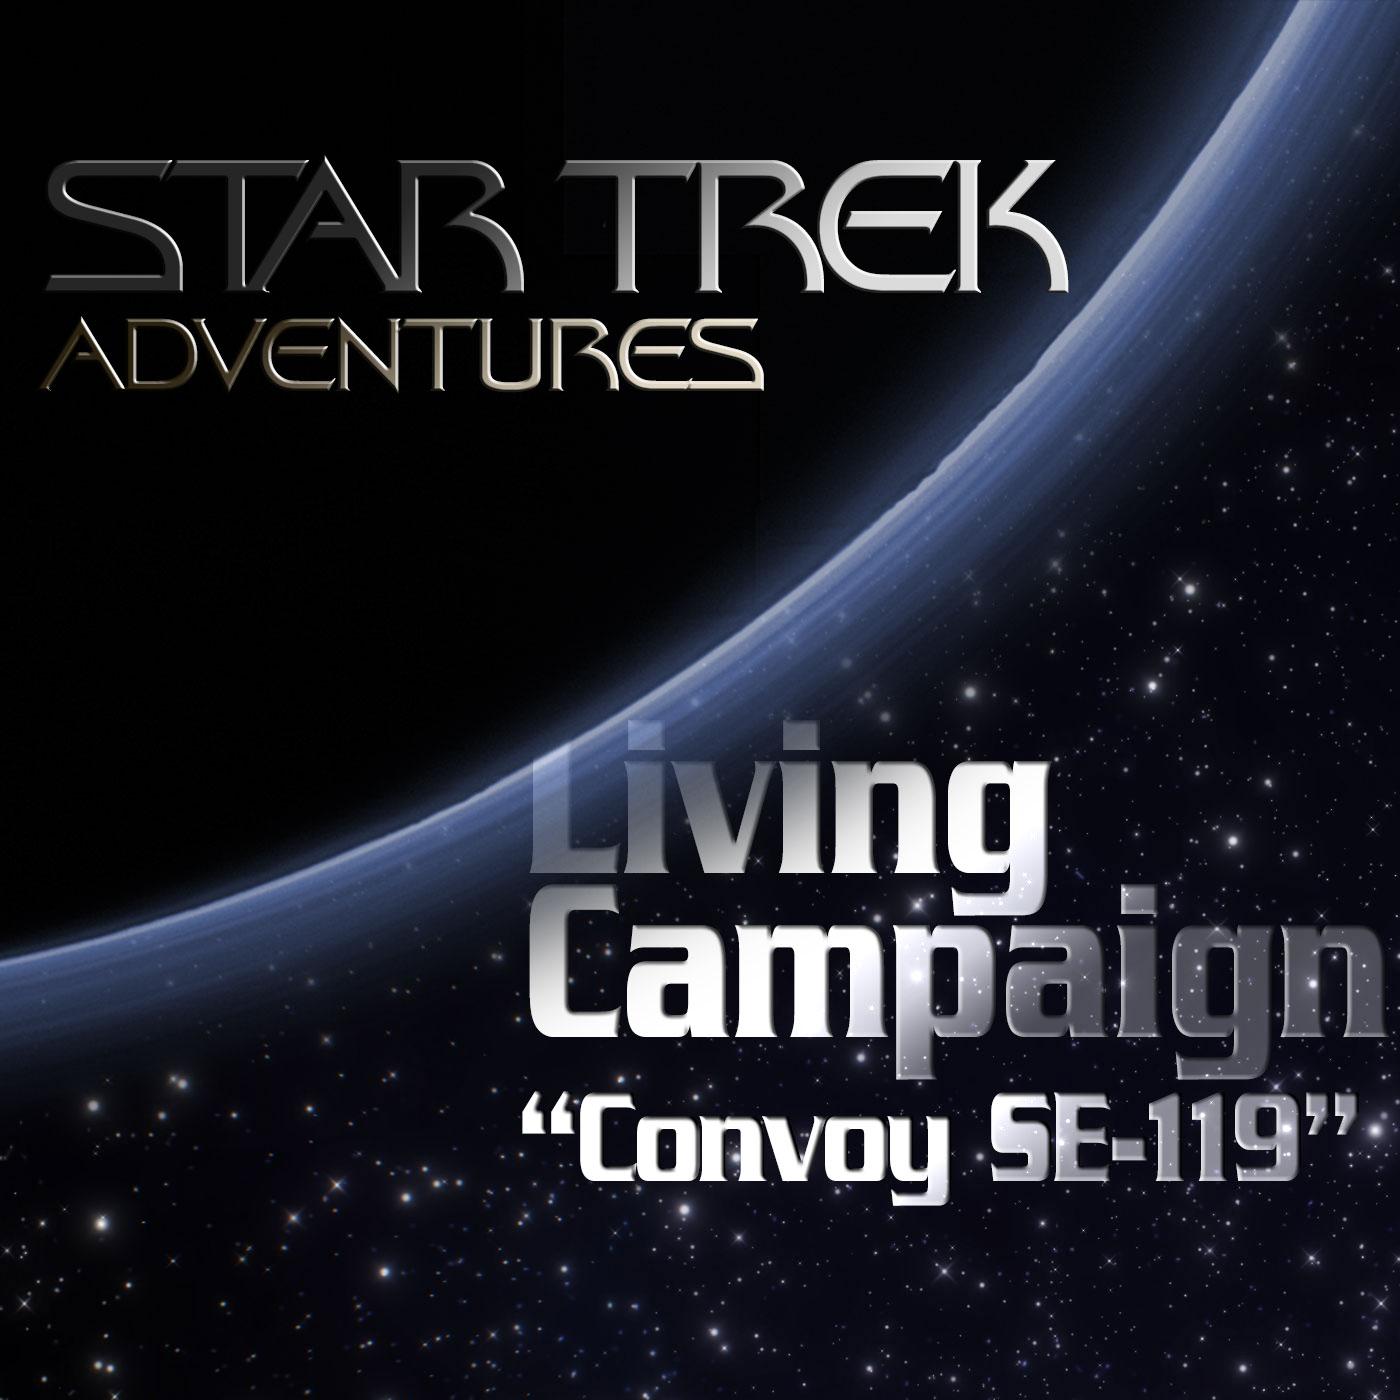 StarTrek-LivingCampaign1-WithLogo.jpg